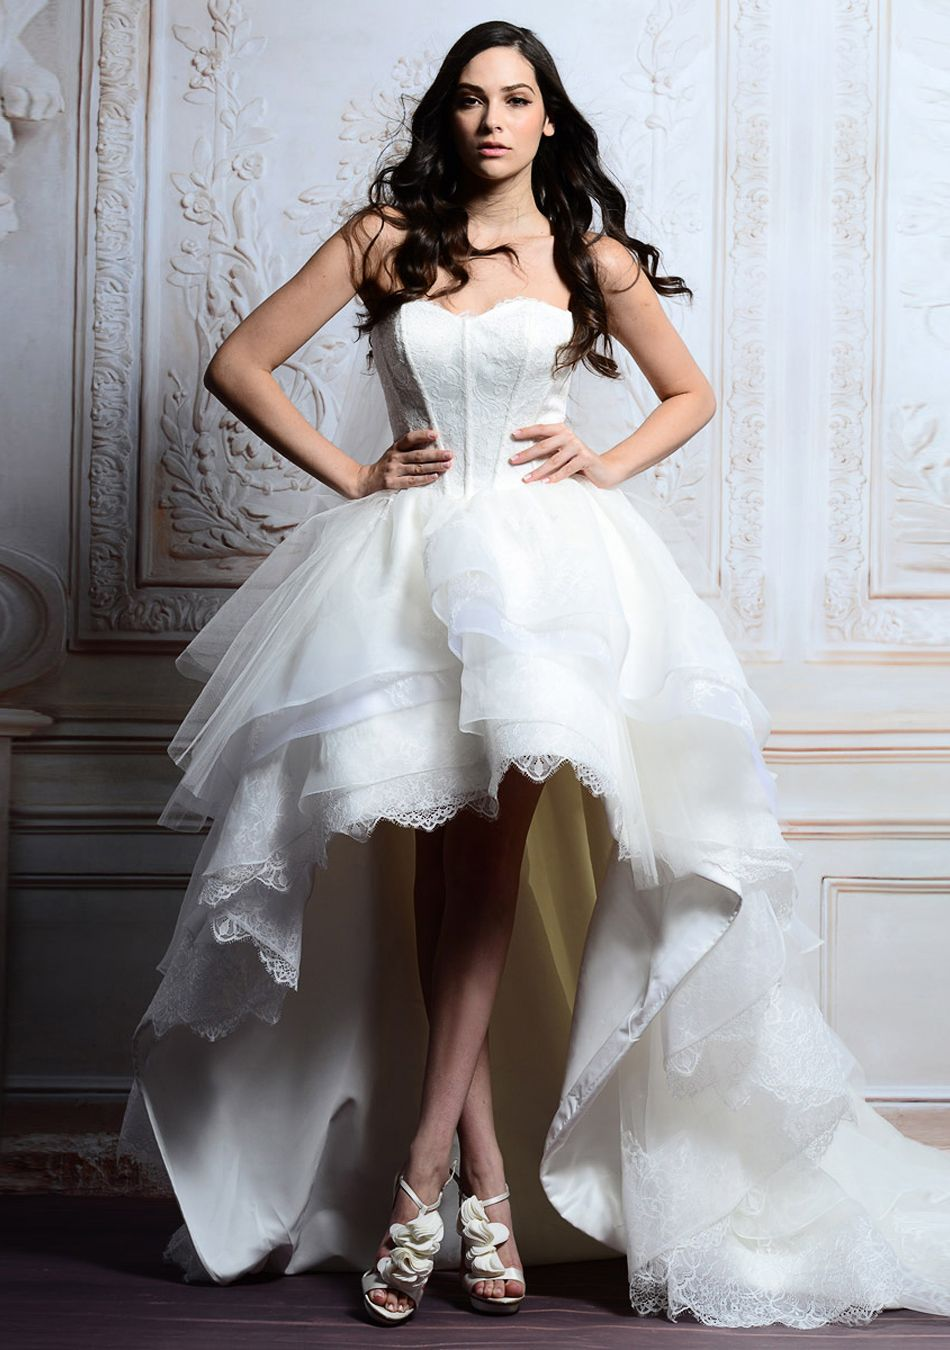 white wedding dresses Fashionable Short White Wedding Dresses Short Wedding Dresses Dresses Starkhickey Regarding Short White Wedding Dress